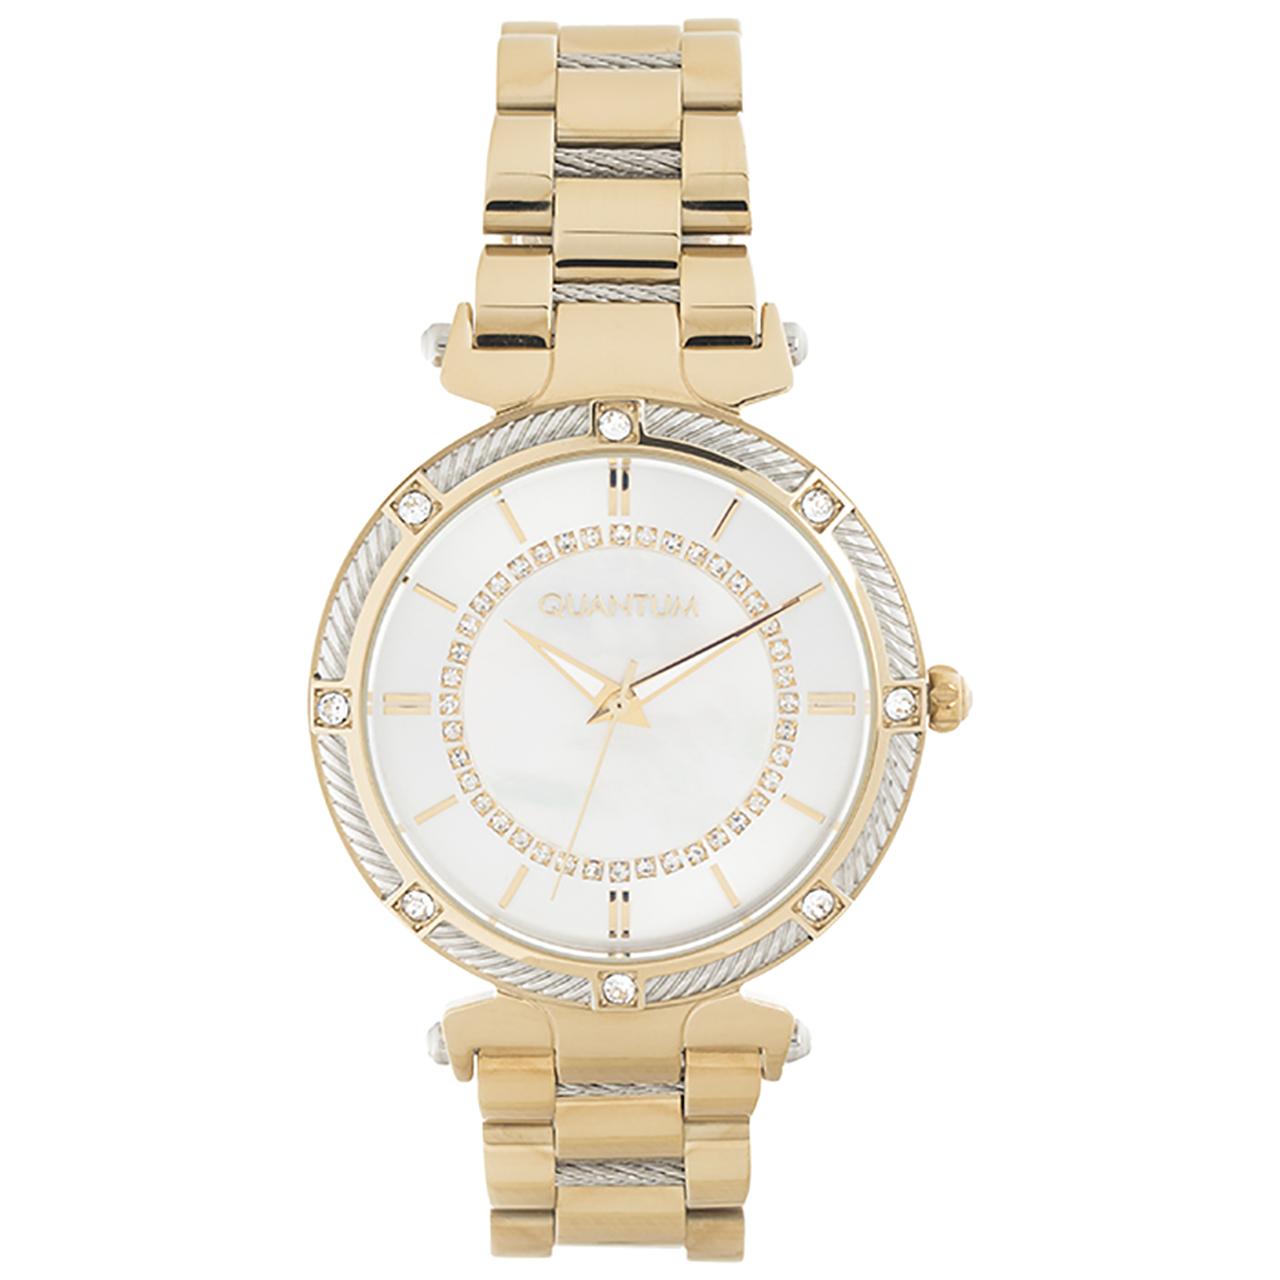 ساعت  زنانه کوانتوم مدل IML659.530